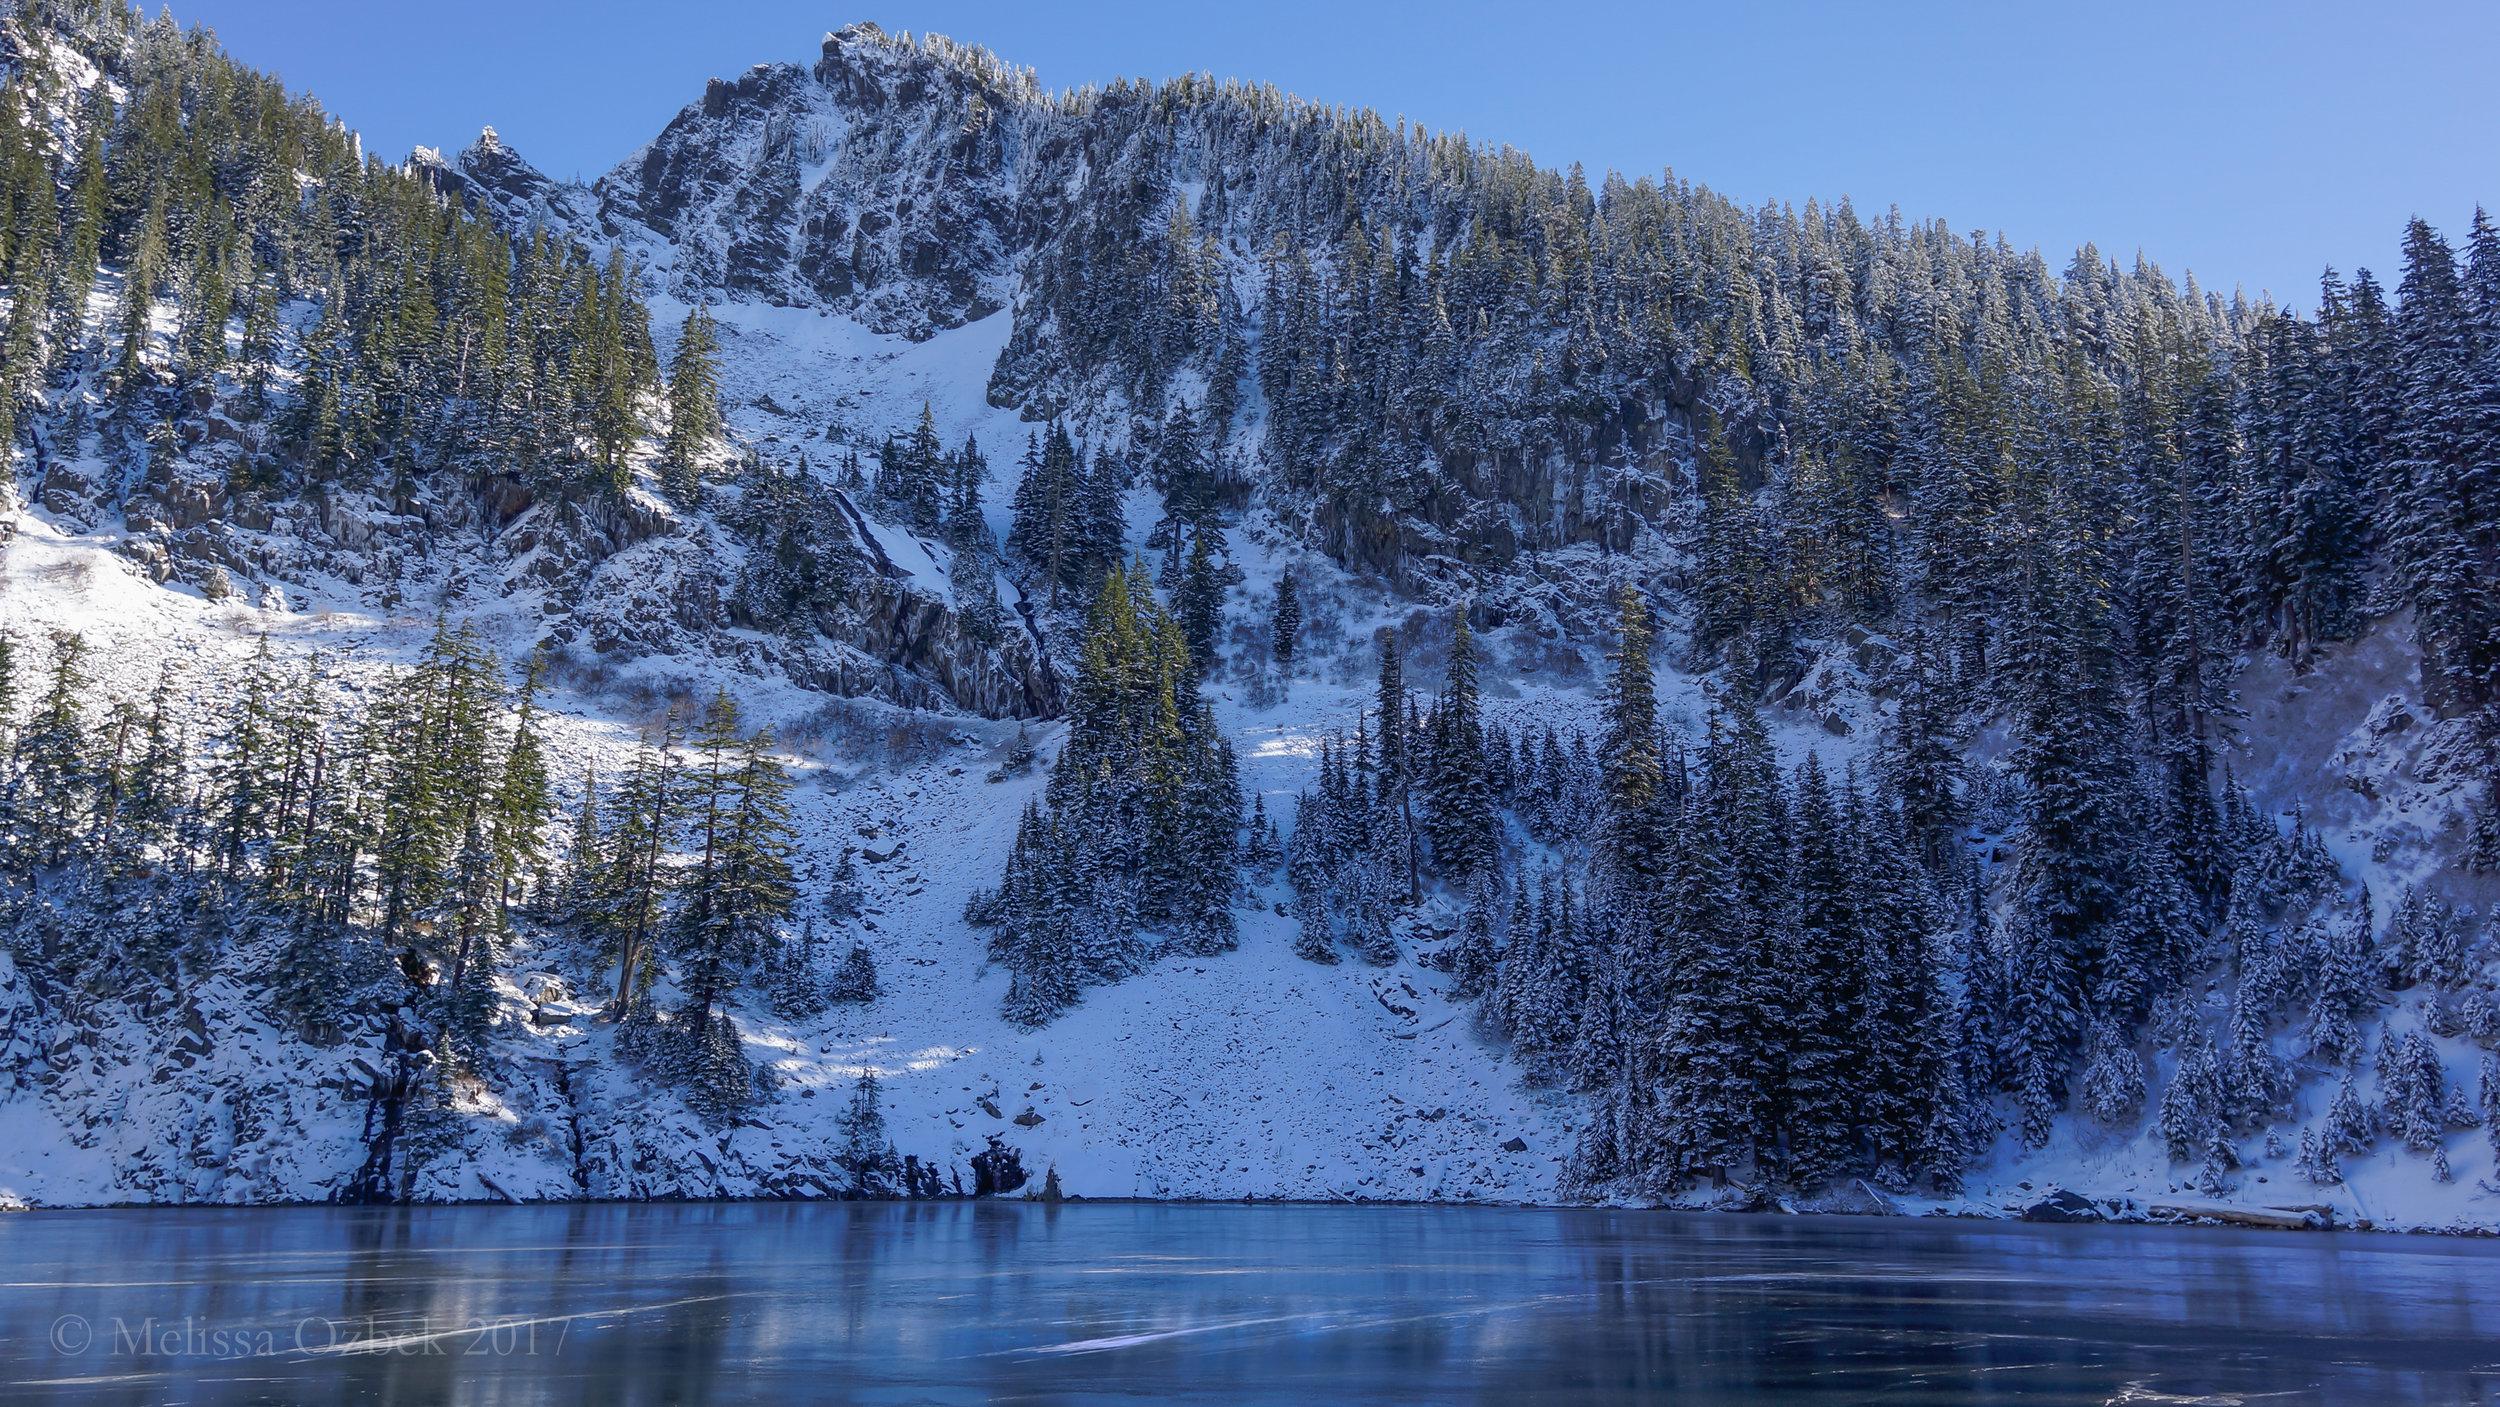 14. Denny Creek Trail to Melakwa Lake